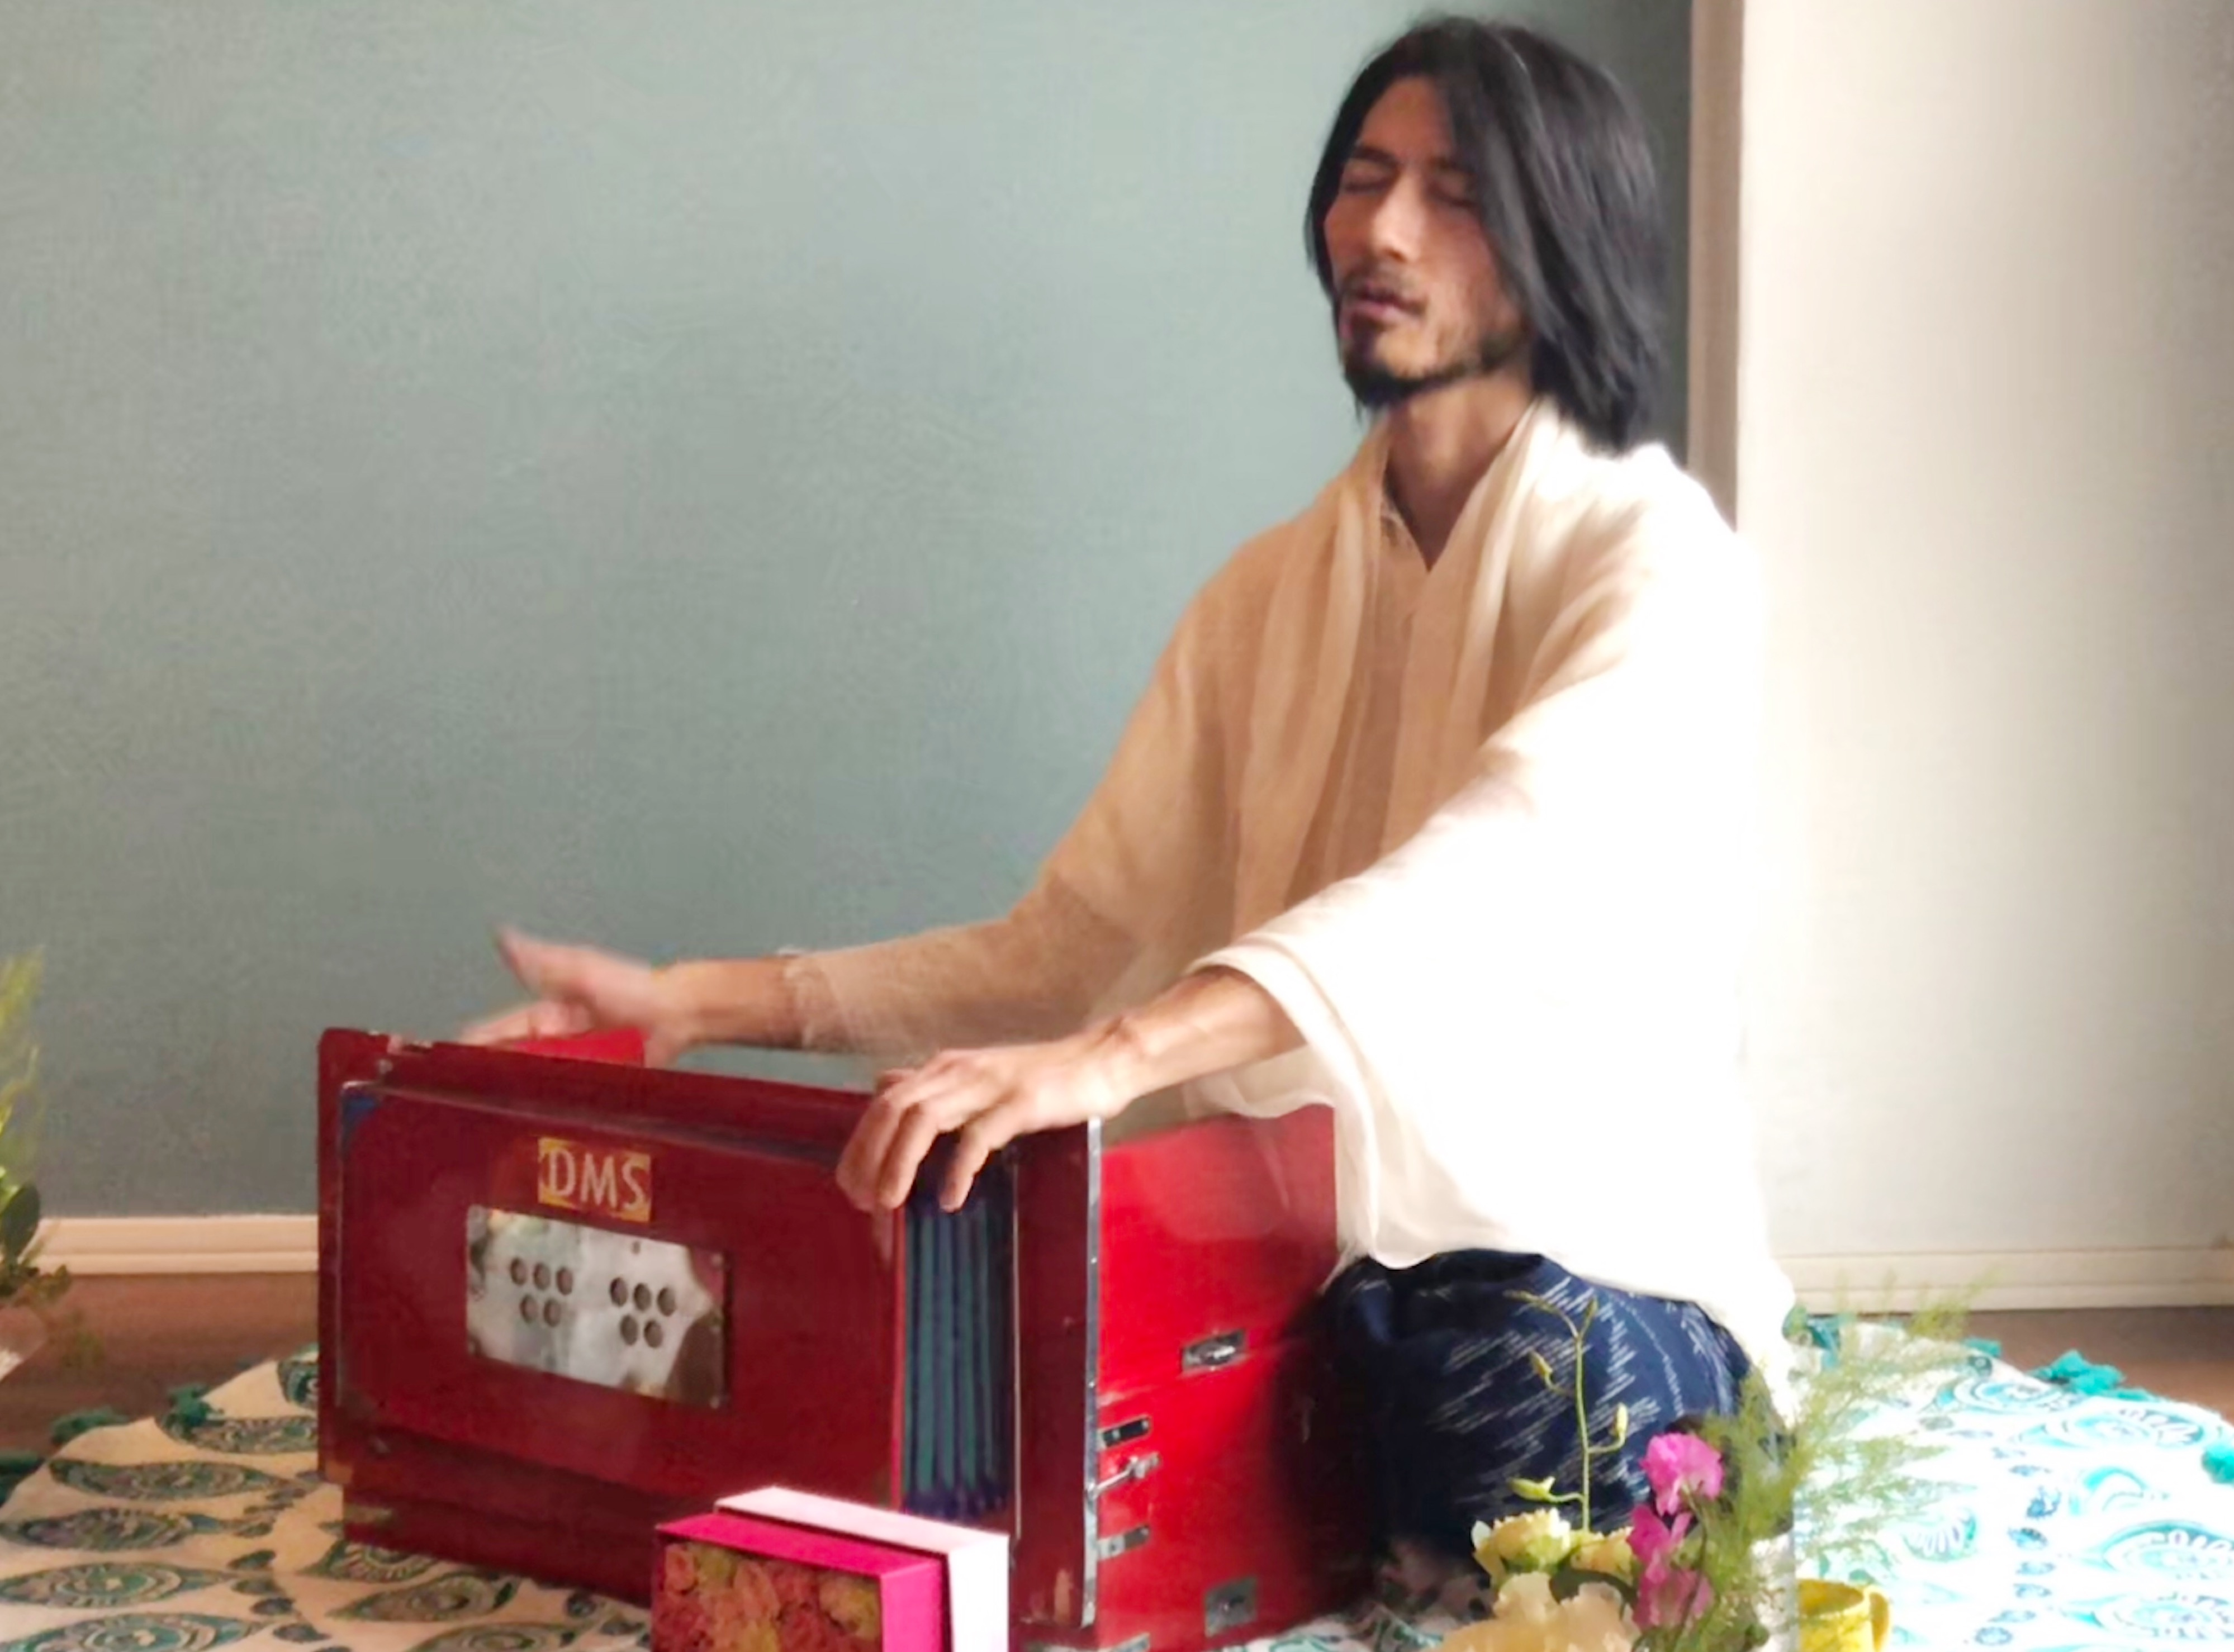 Biotope Yoga Studio 【ビオトープヨガスタジオ】 - 新月の祈り -new moon KIRTAN- with 堀田義樹の写真2